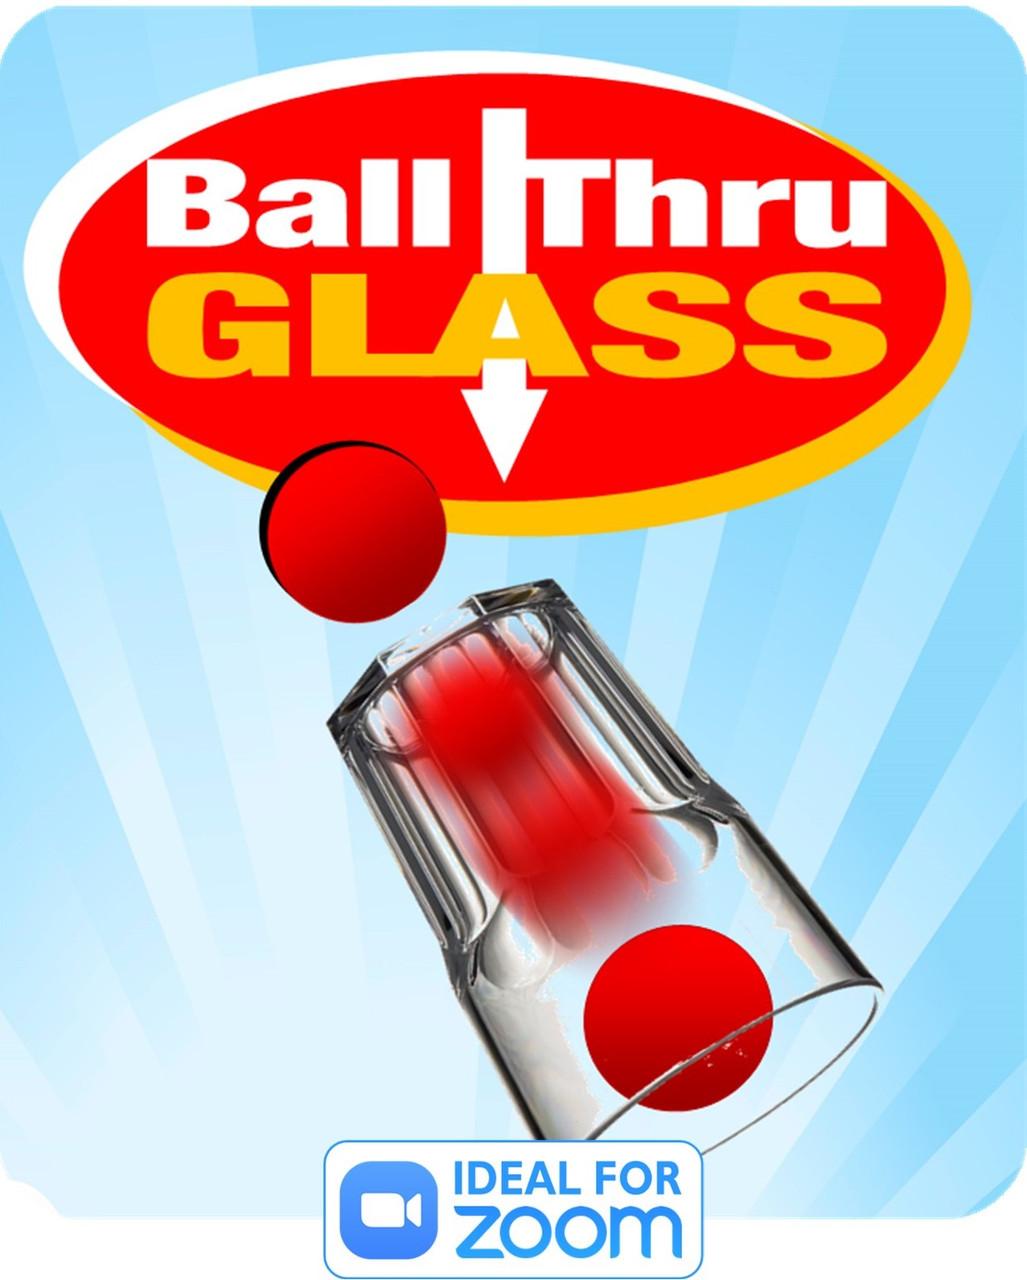 Ball Thru Glass - Gospel Magic Trick -Christ in Us